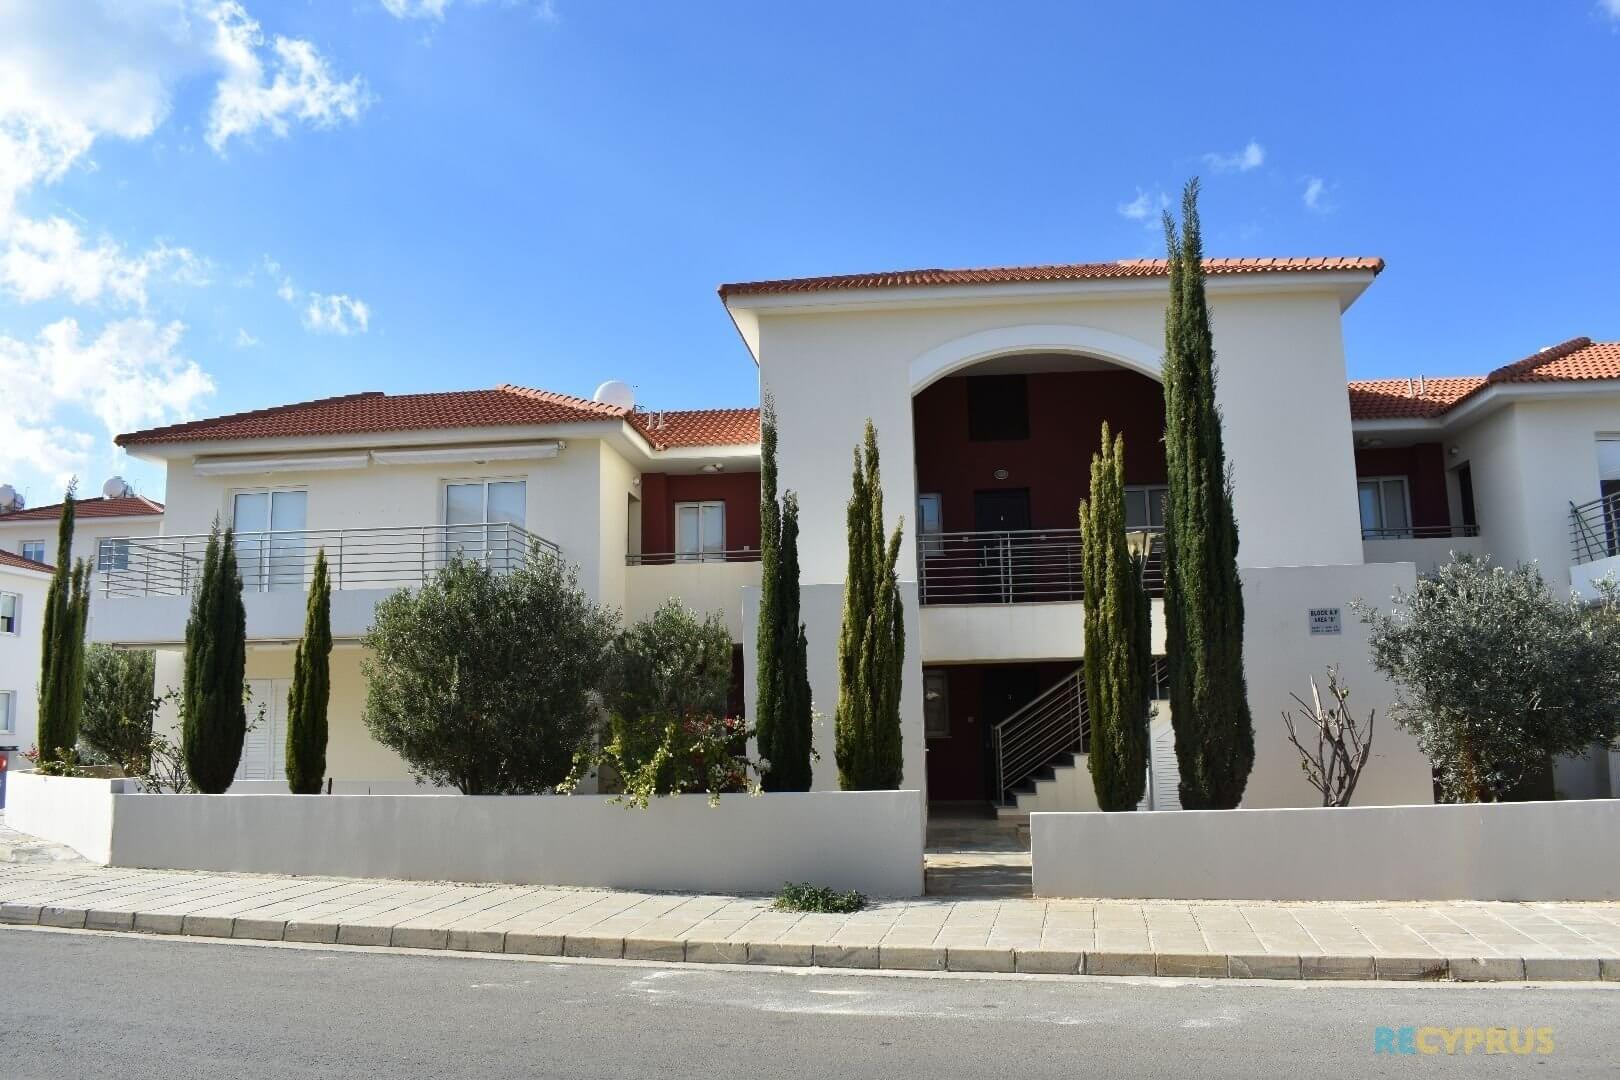 Apartment for sale Kapparis Famagusta Cyprus 3 3516